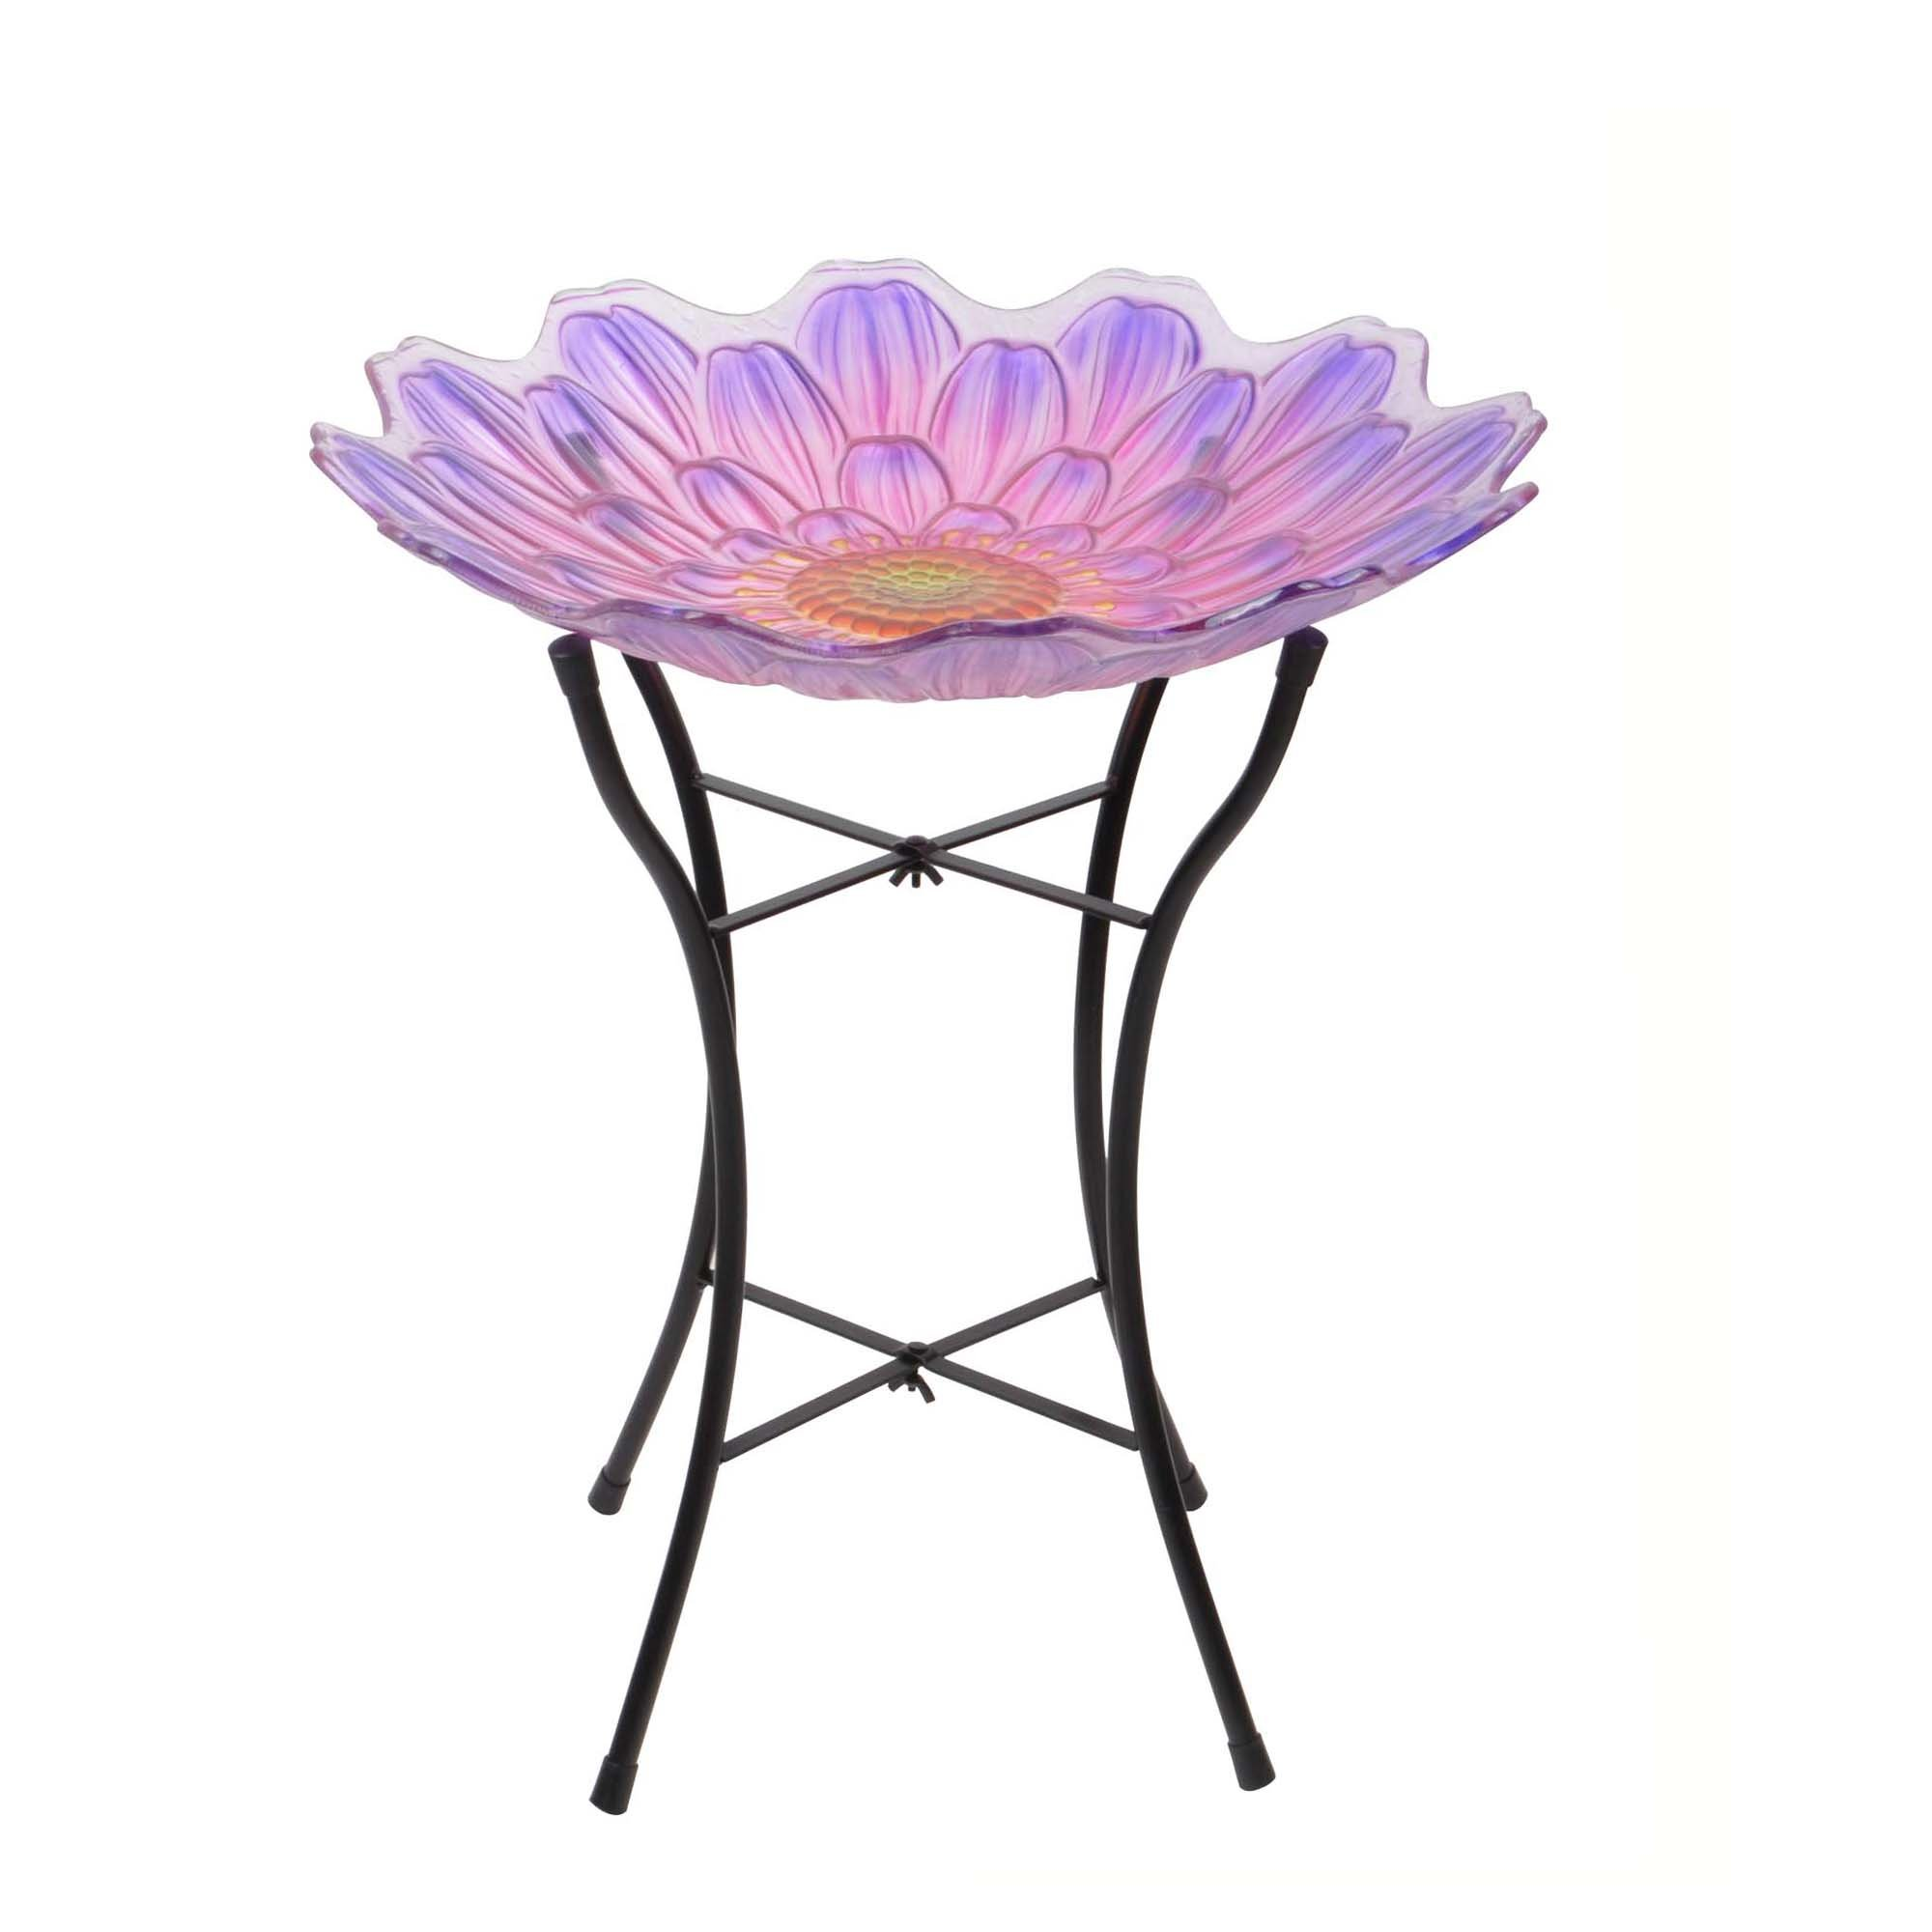 Peaktop Outdoor 18'' Flower Glass Birdbath w/Metal Stand - Pink and Purple